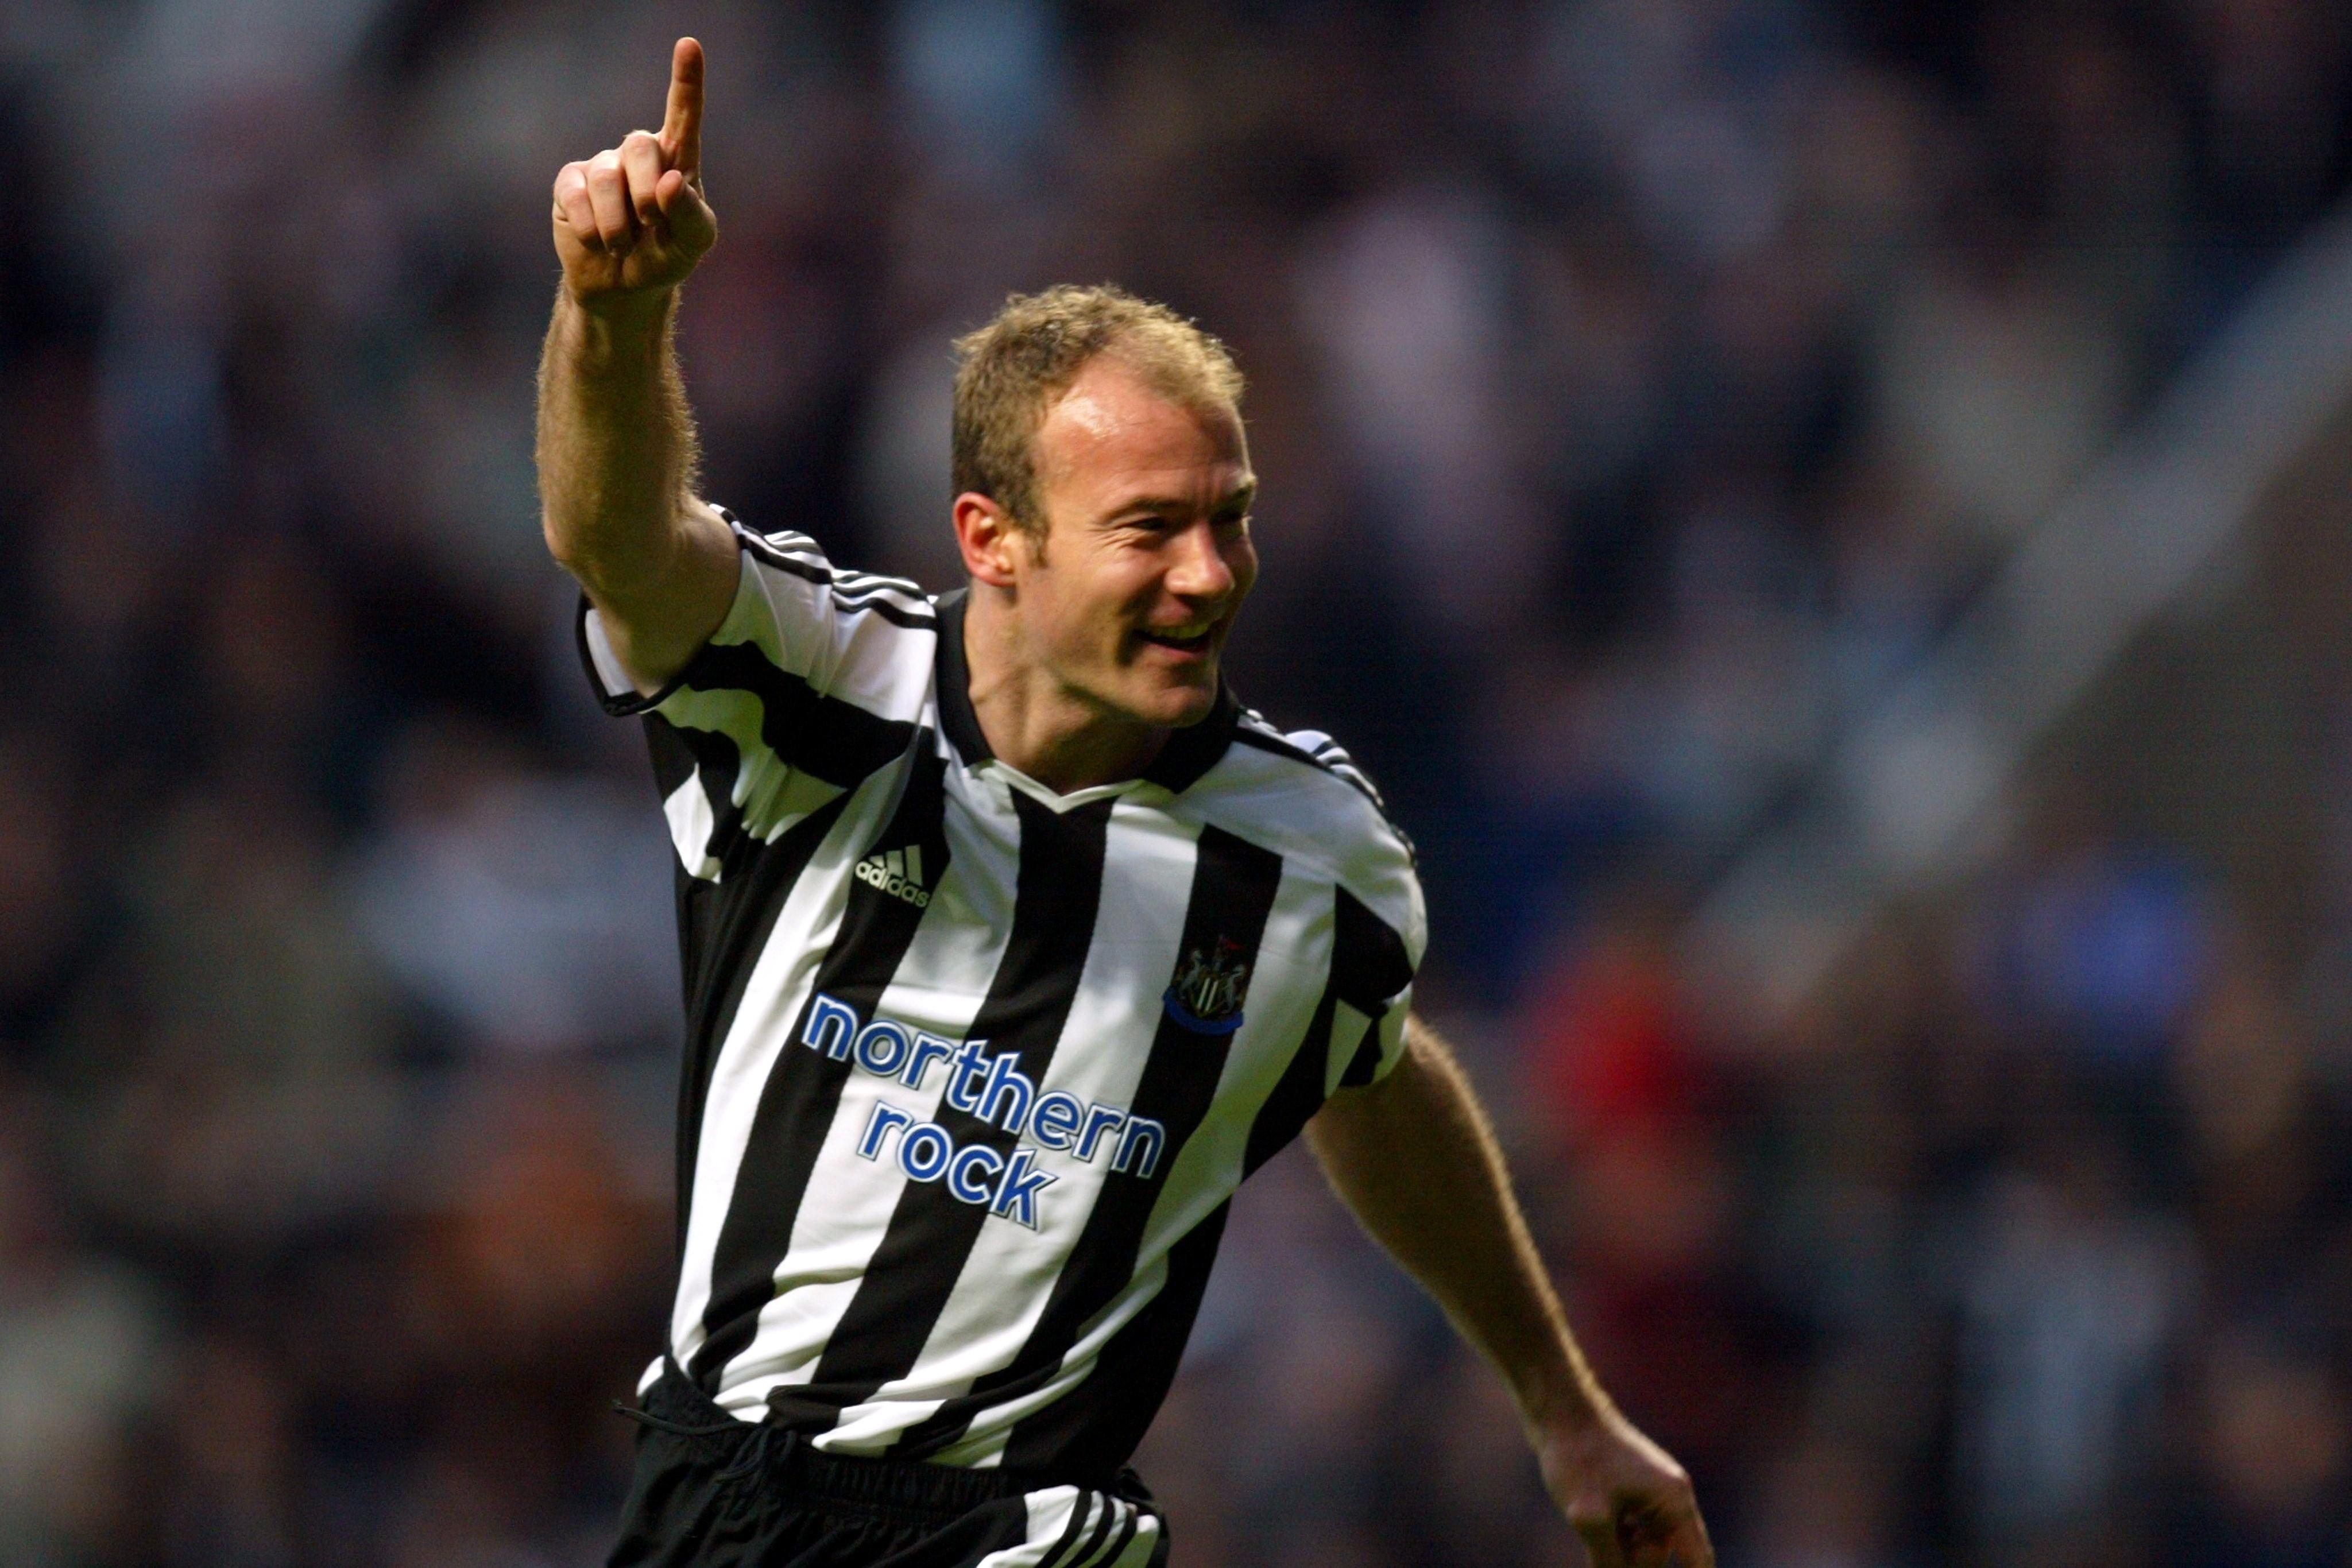 Alan Shearer, Newcastle United, England, World Cup 2014